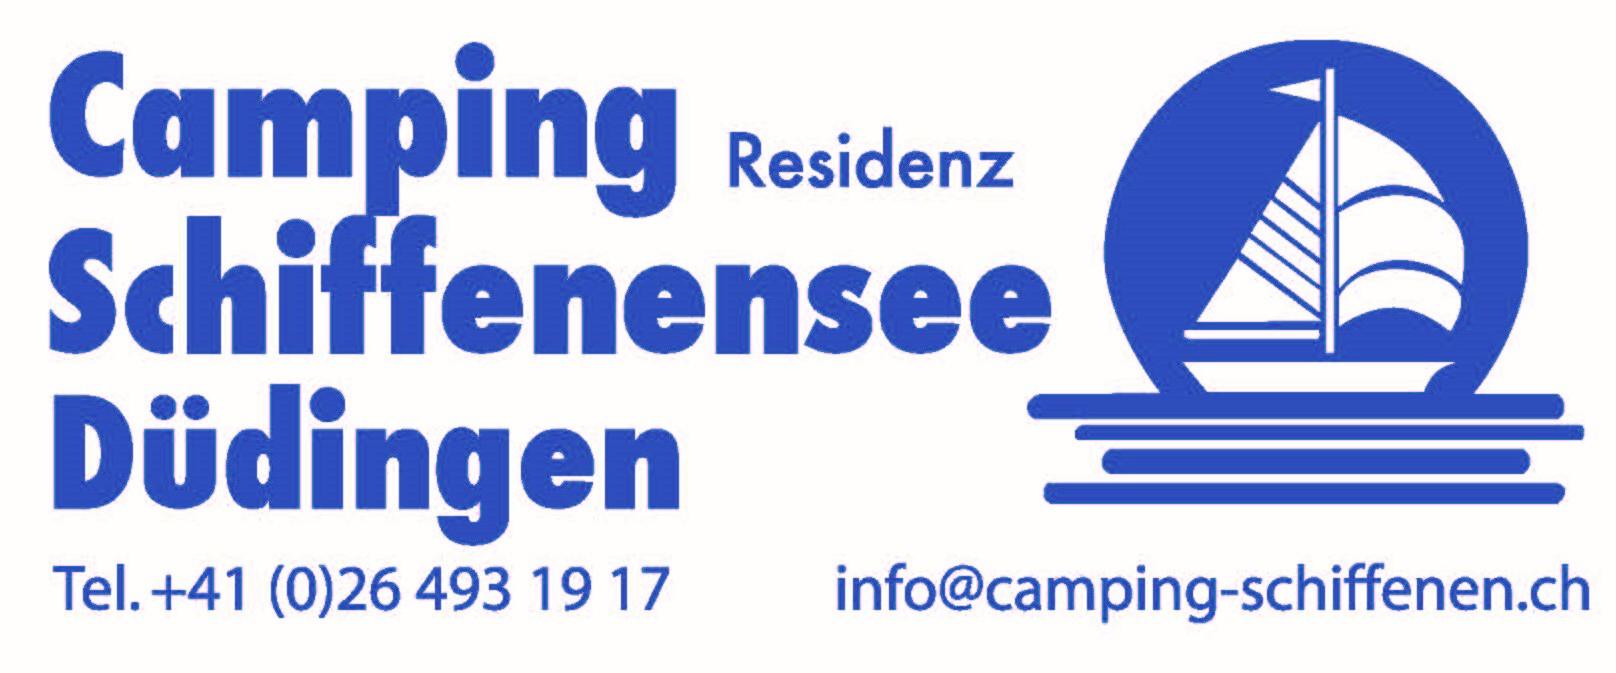 Camping Schiffenensee Düdingen